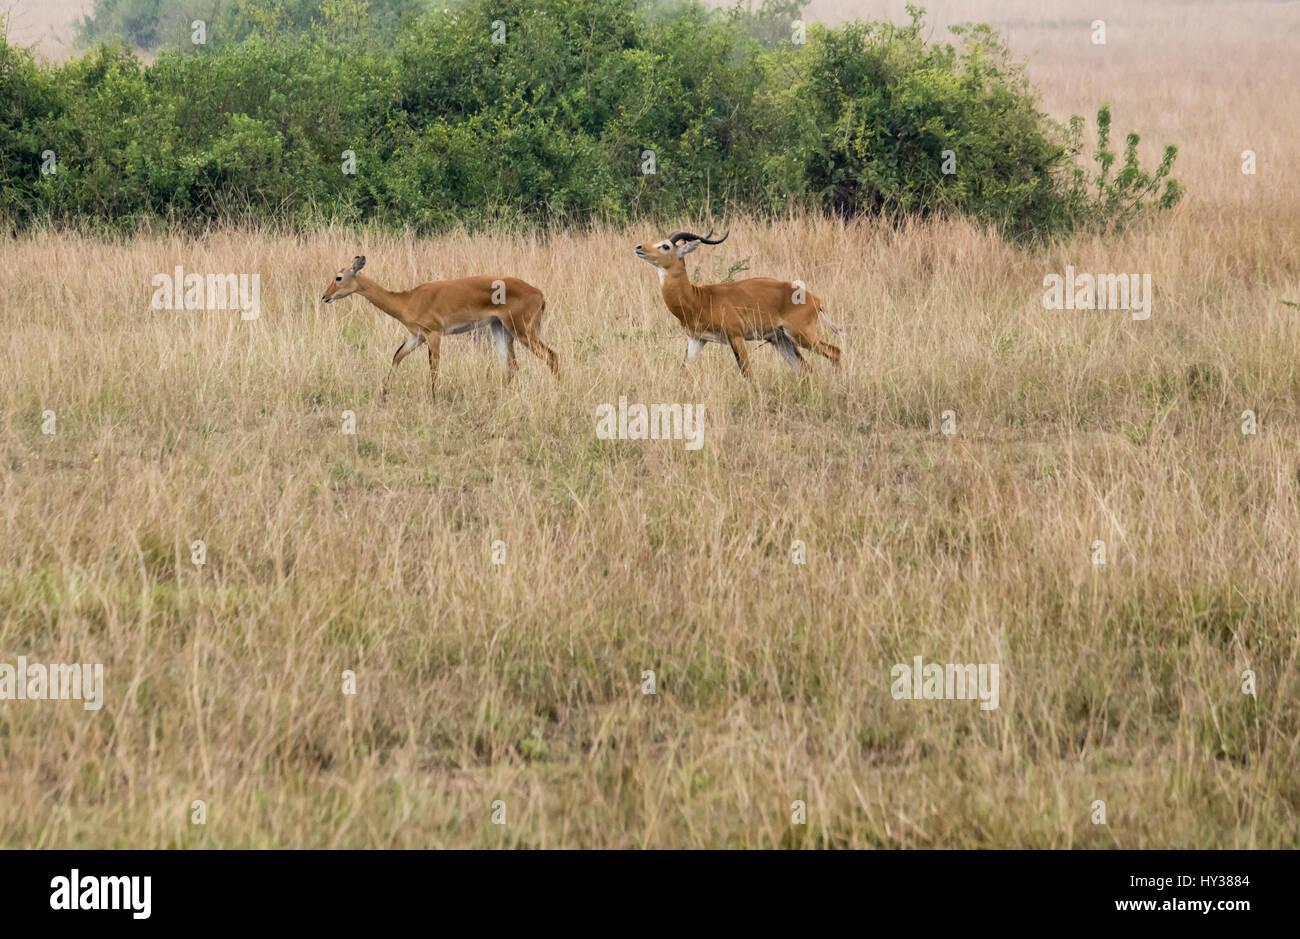 Kob antelope on mating grounds in Queen Elizabeth National Park, Uganda, Africa. - Stock Image